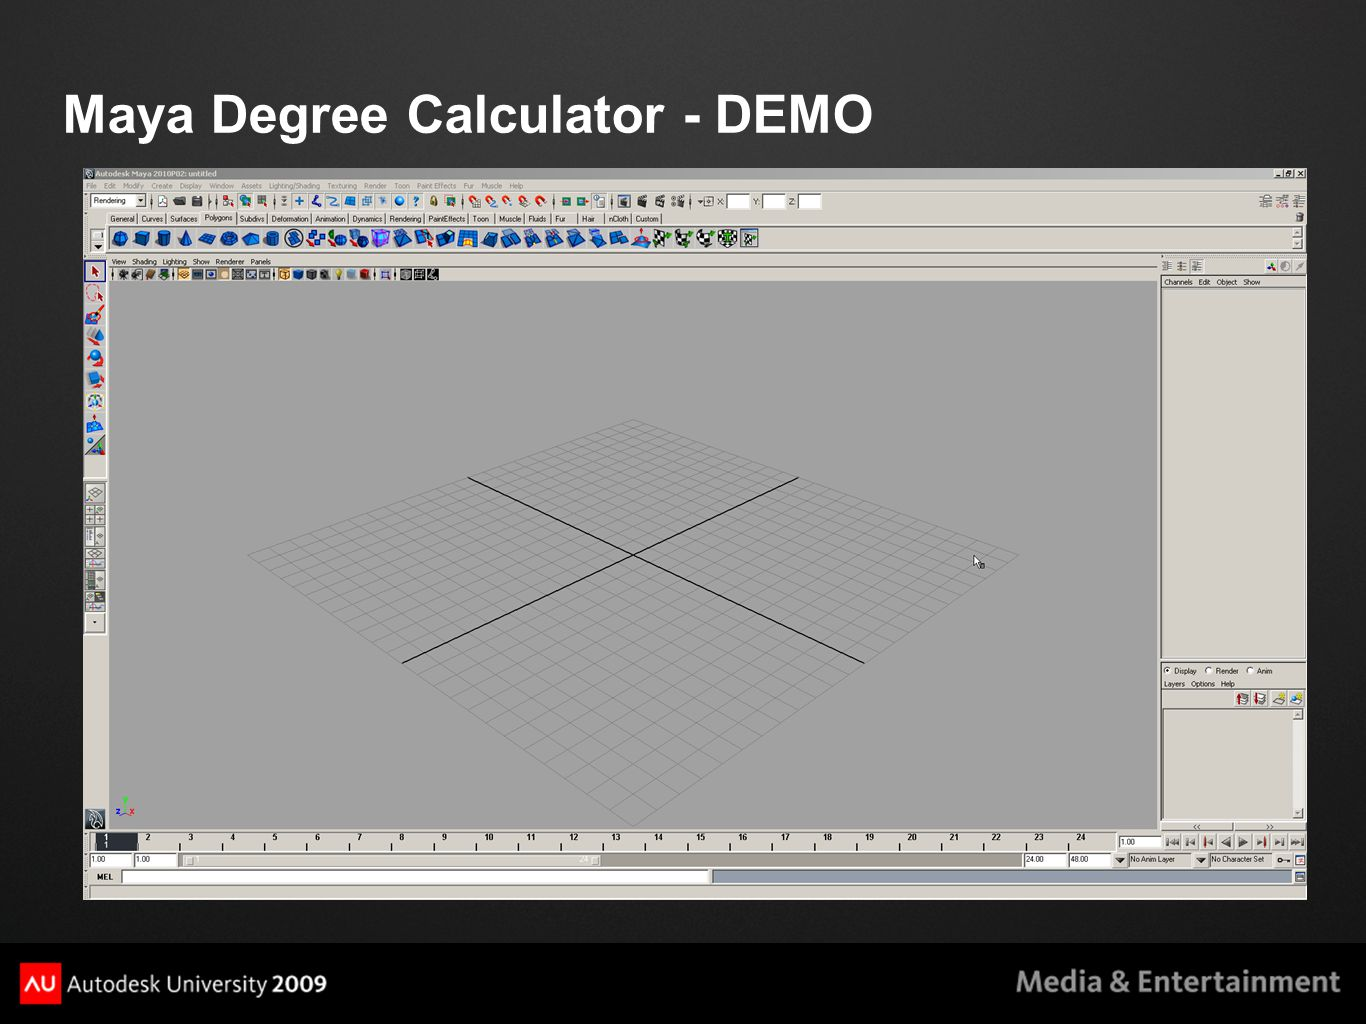 Maya Degree Calculator - DEMO